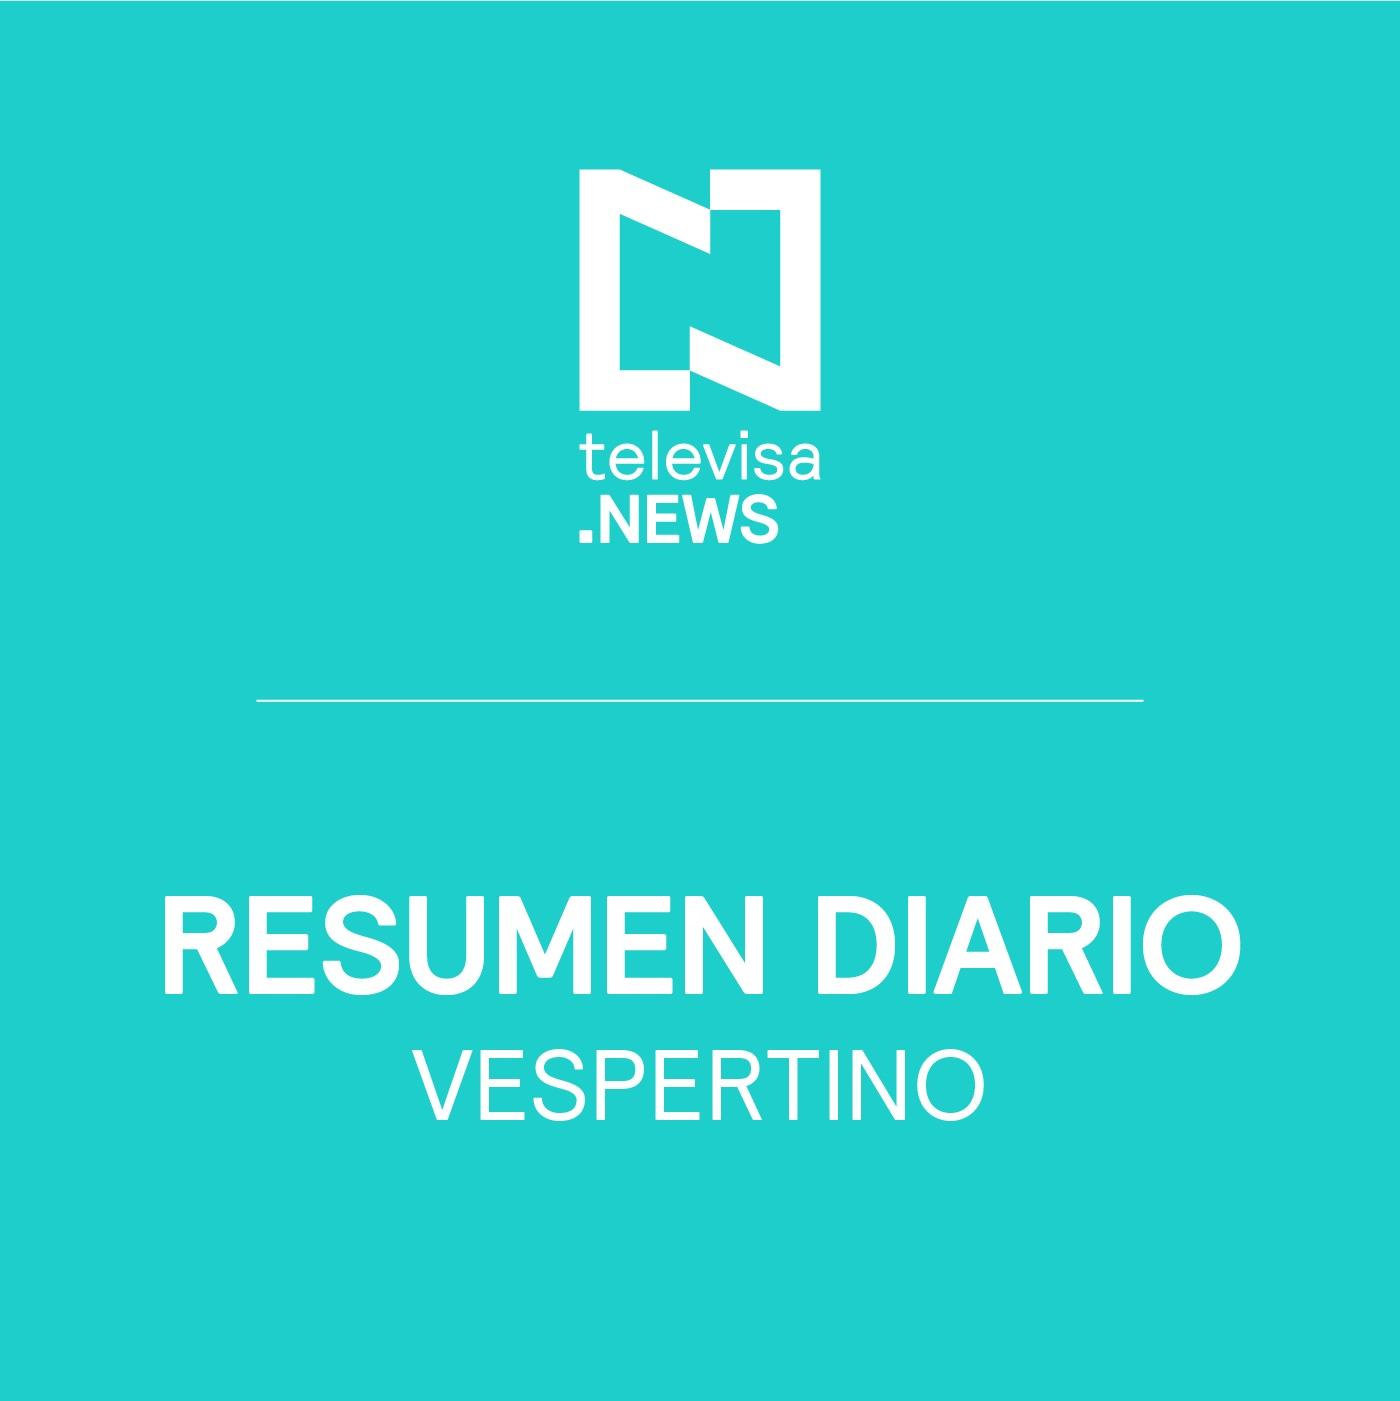 NT_Resumen Diario_VESP